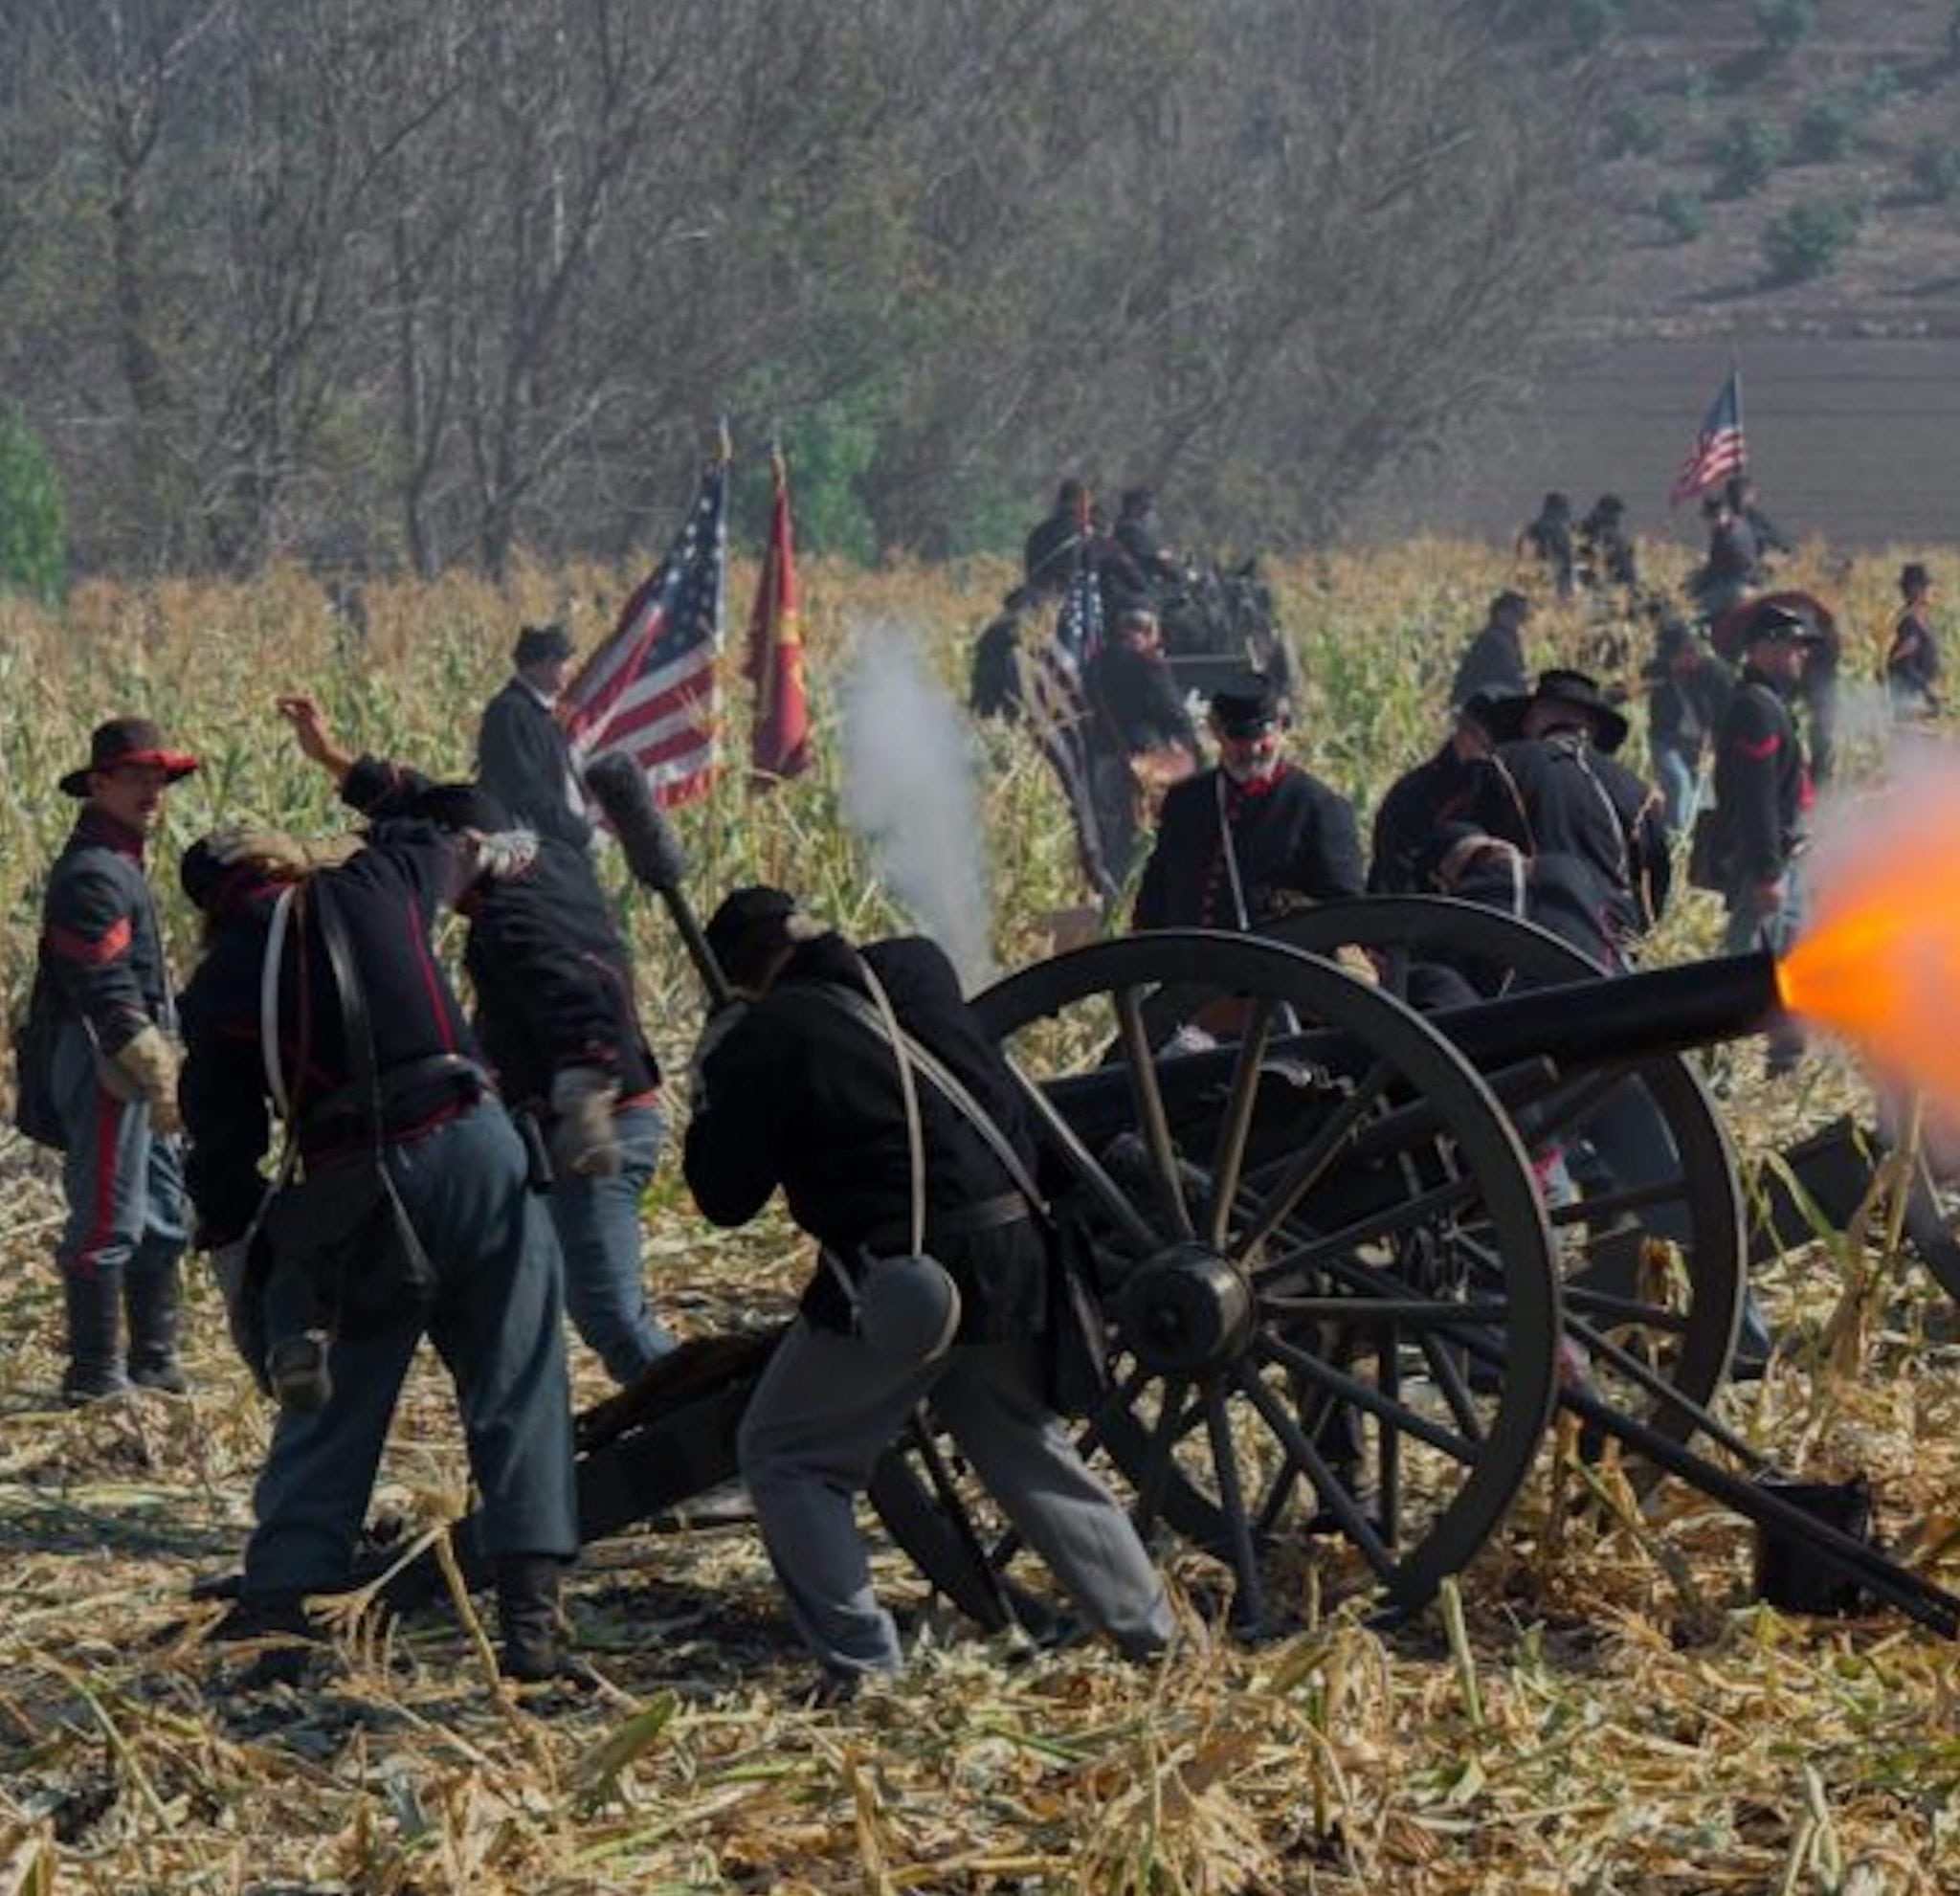 The 17th Annual Blue & The Gray Civil War Reenactment